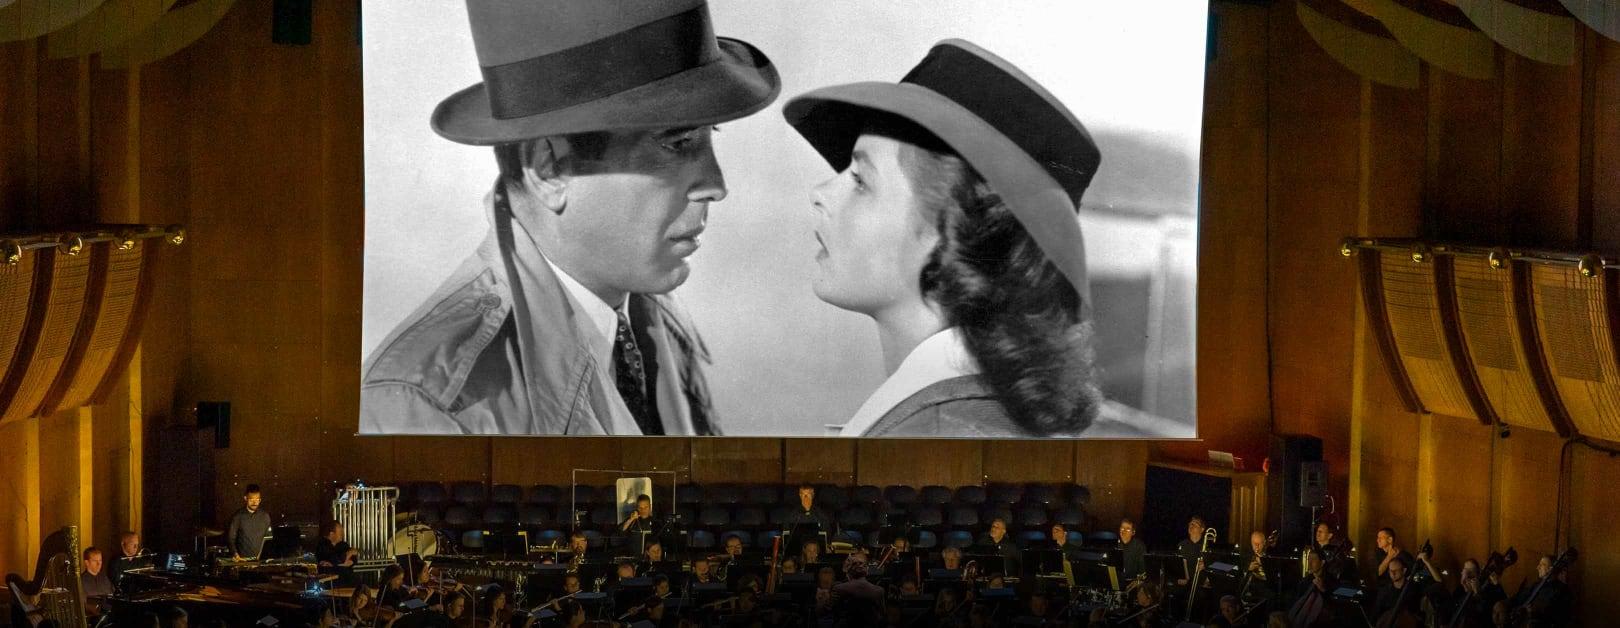 CANCELLED: Casablanca in Concert